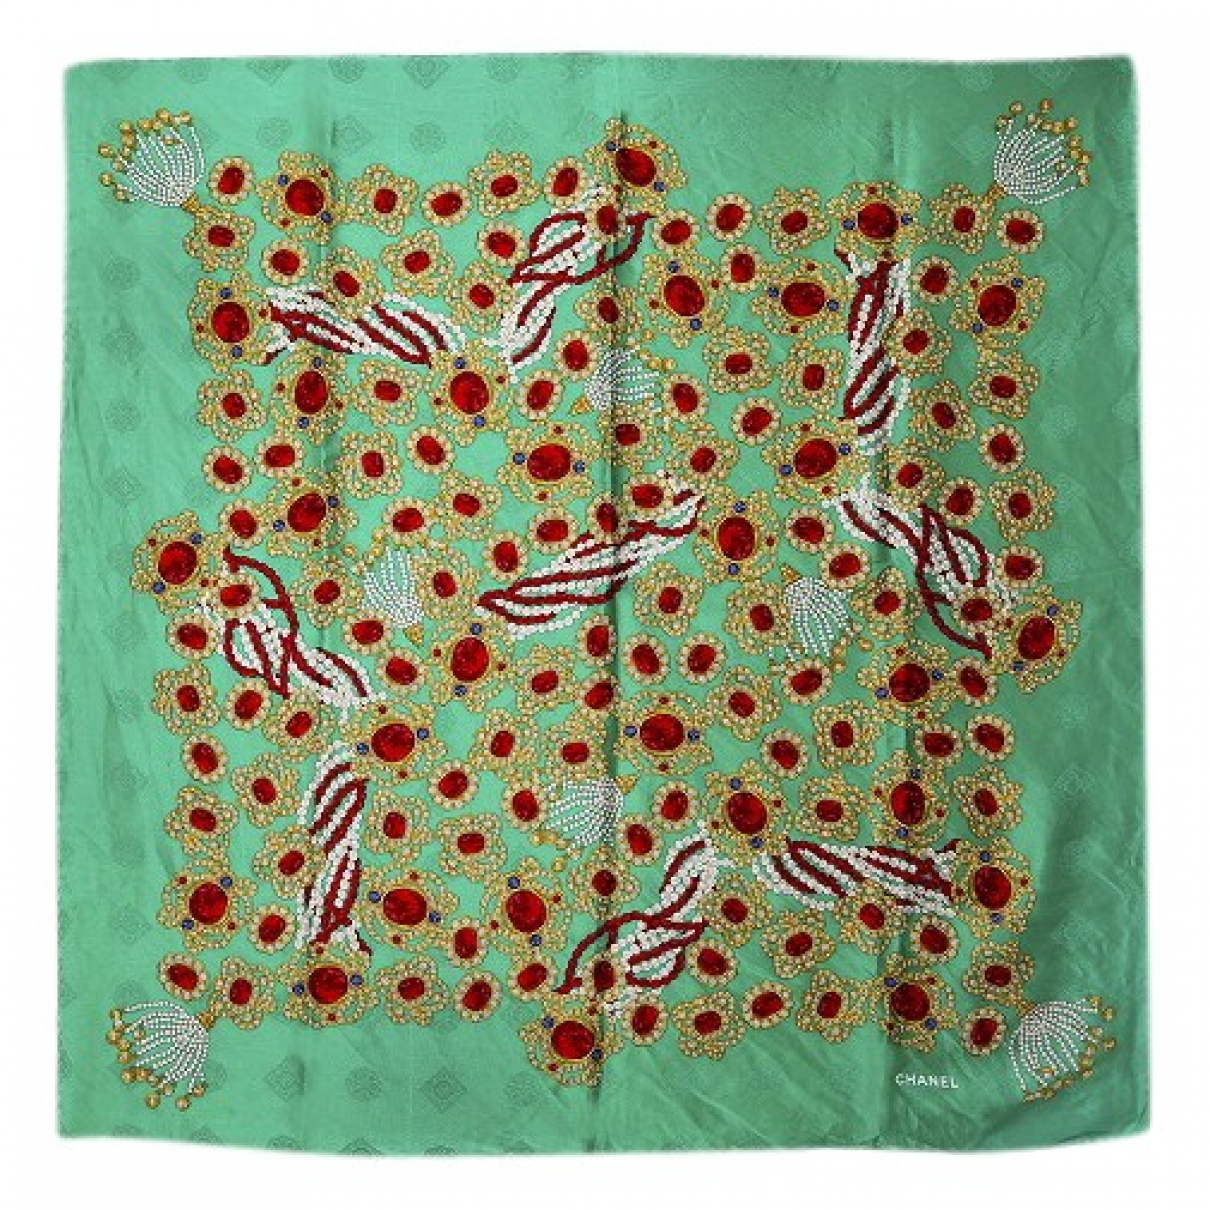 Chanel - Foulard   pour femme en soie - vert